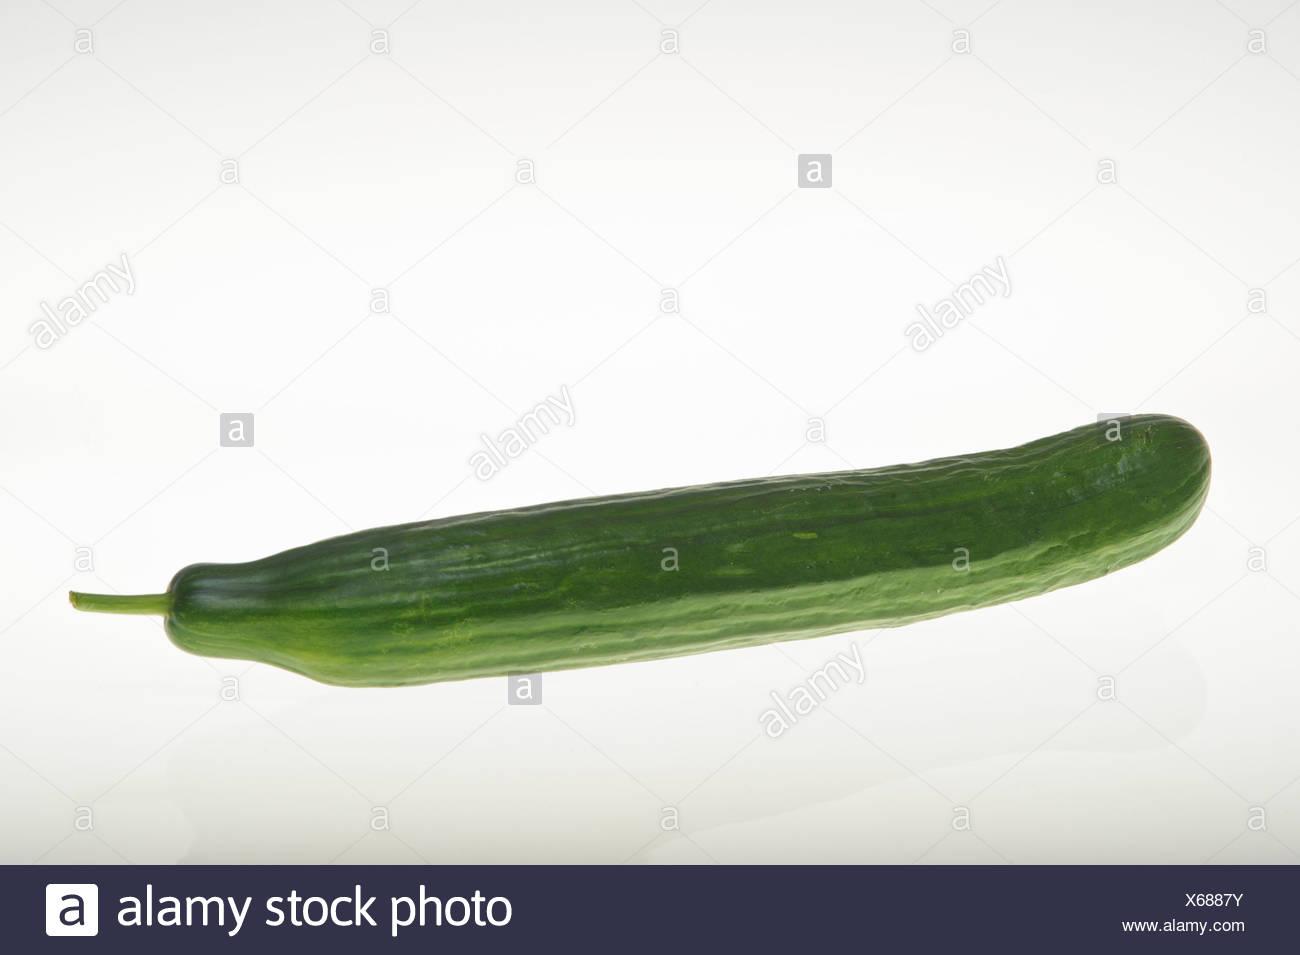 Cucumber, studio photograph - Stock Image